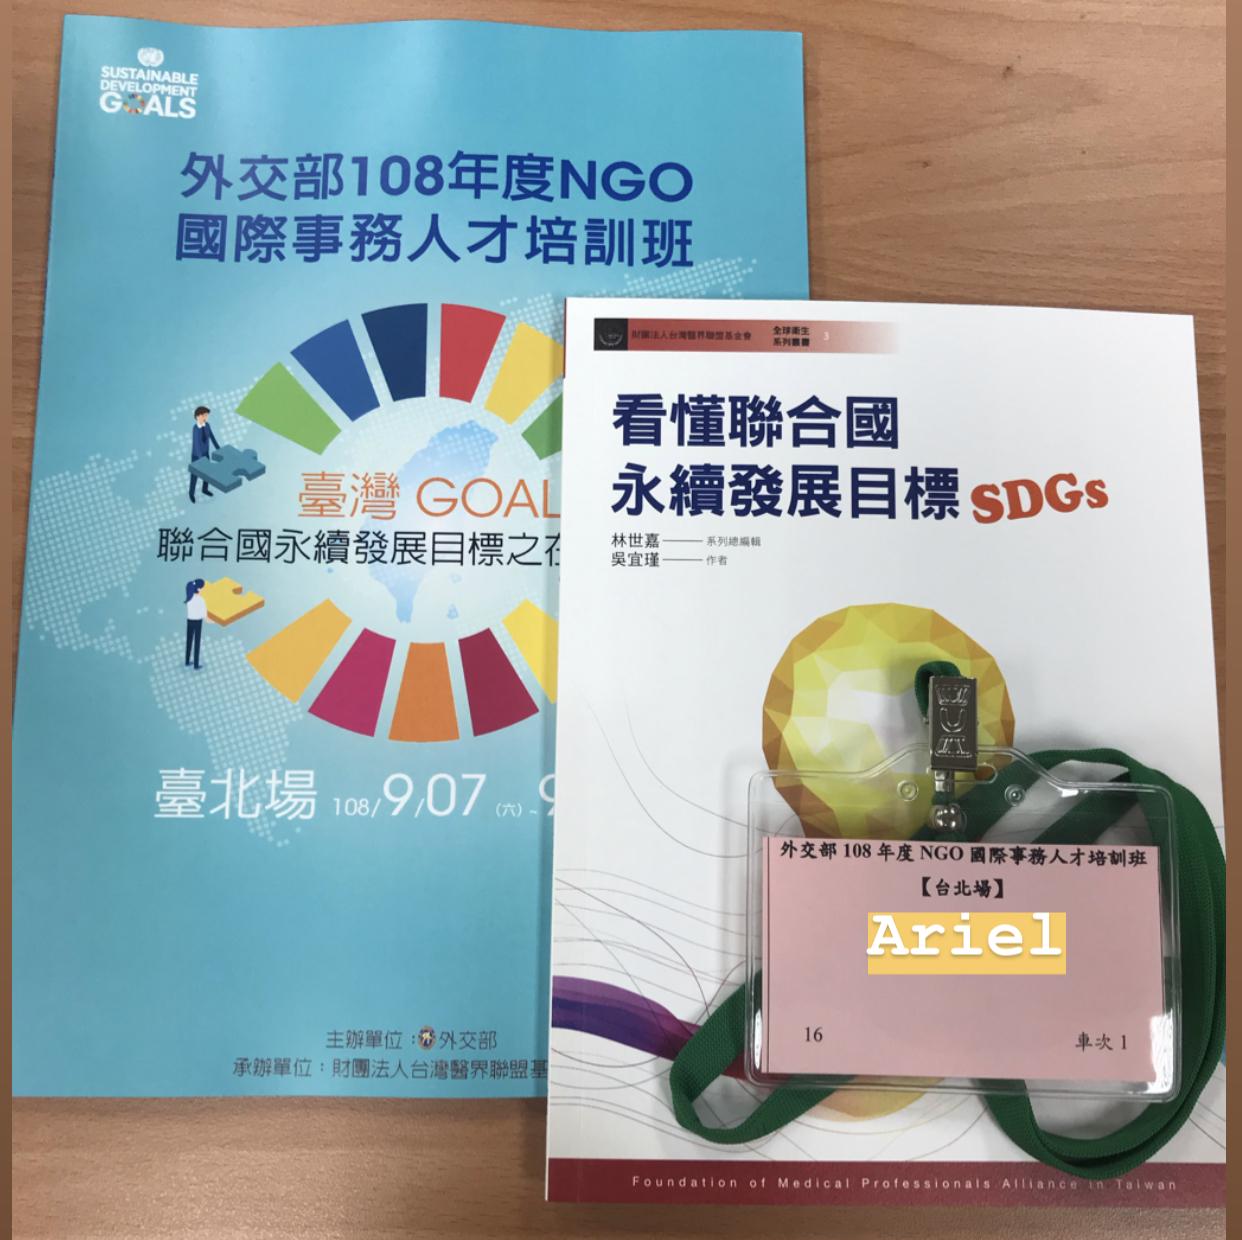 🌱NGO/SDGs/國際事務/留學前後國際觀/營養師的角色